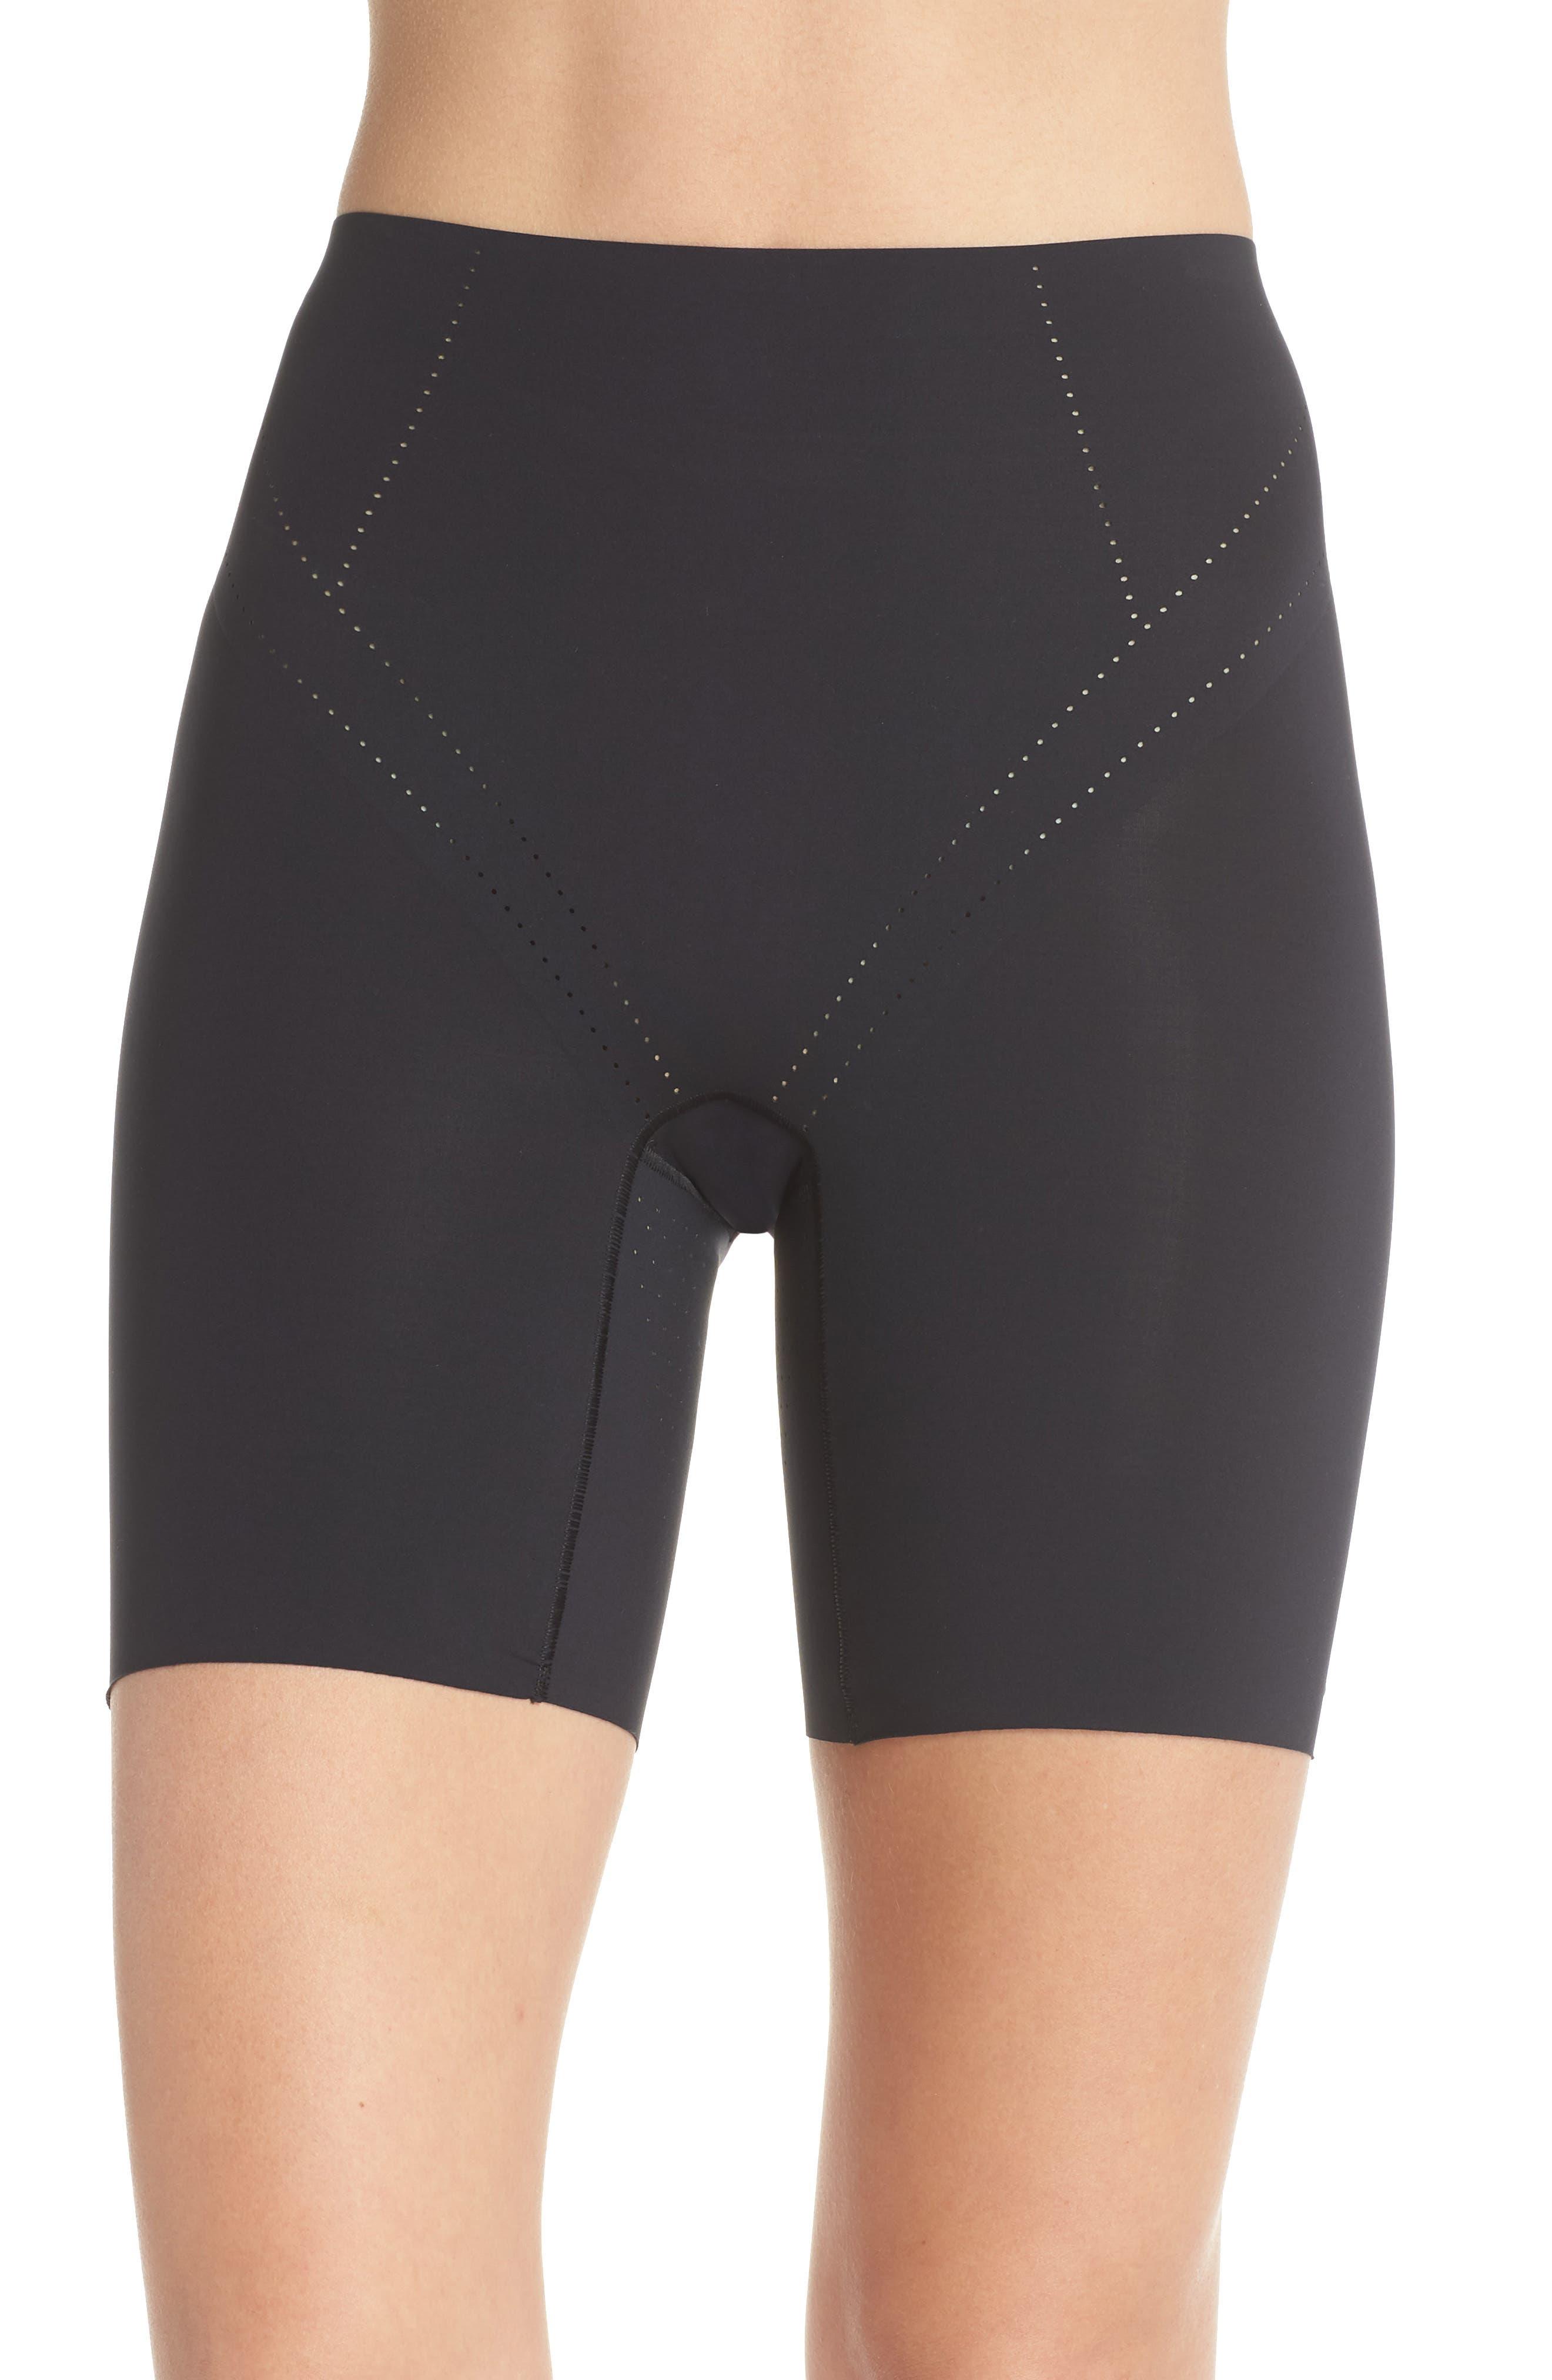 Shape Air Shaper Shorts,                             Main thumbnail 1, color,                             Black